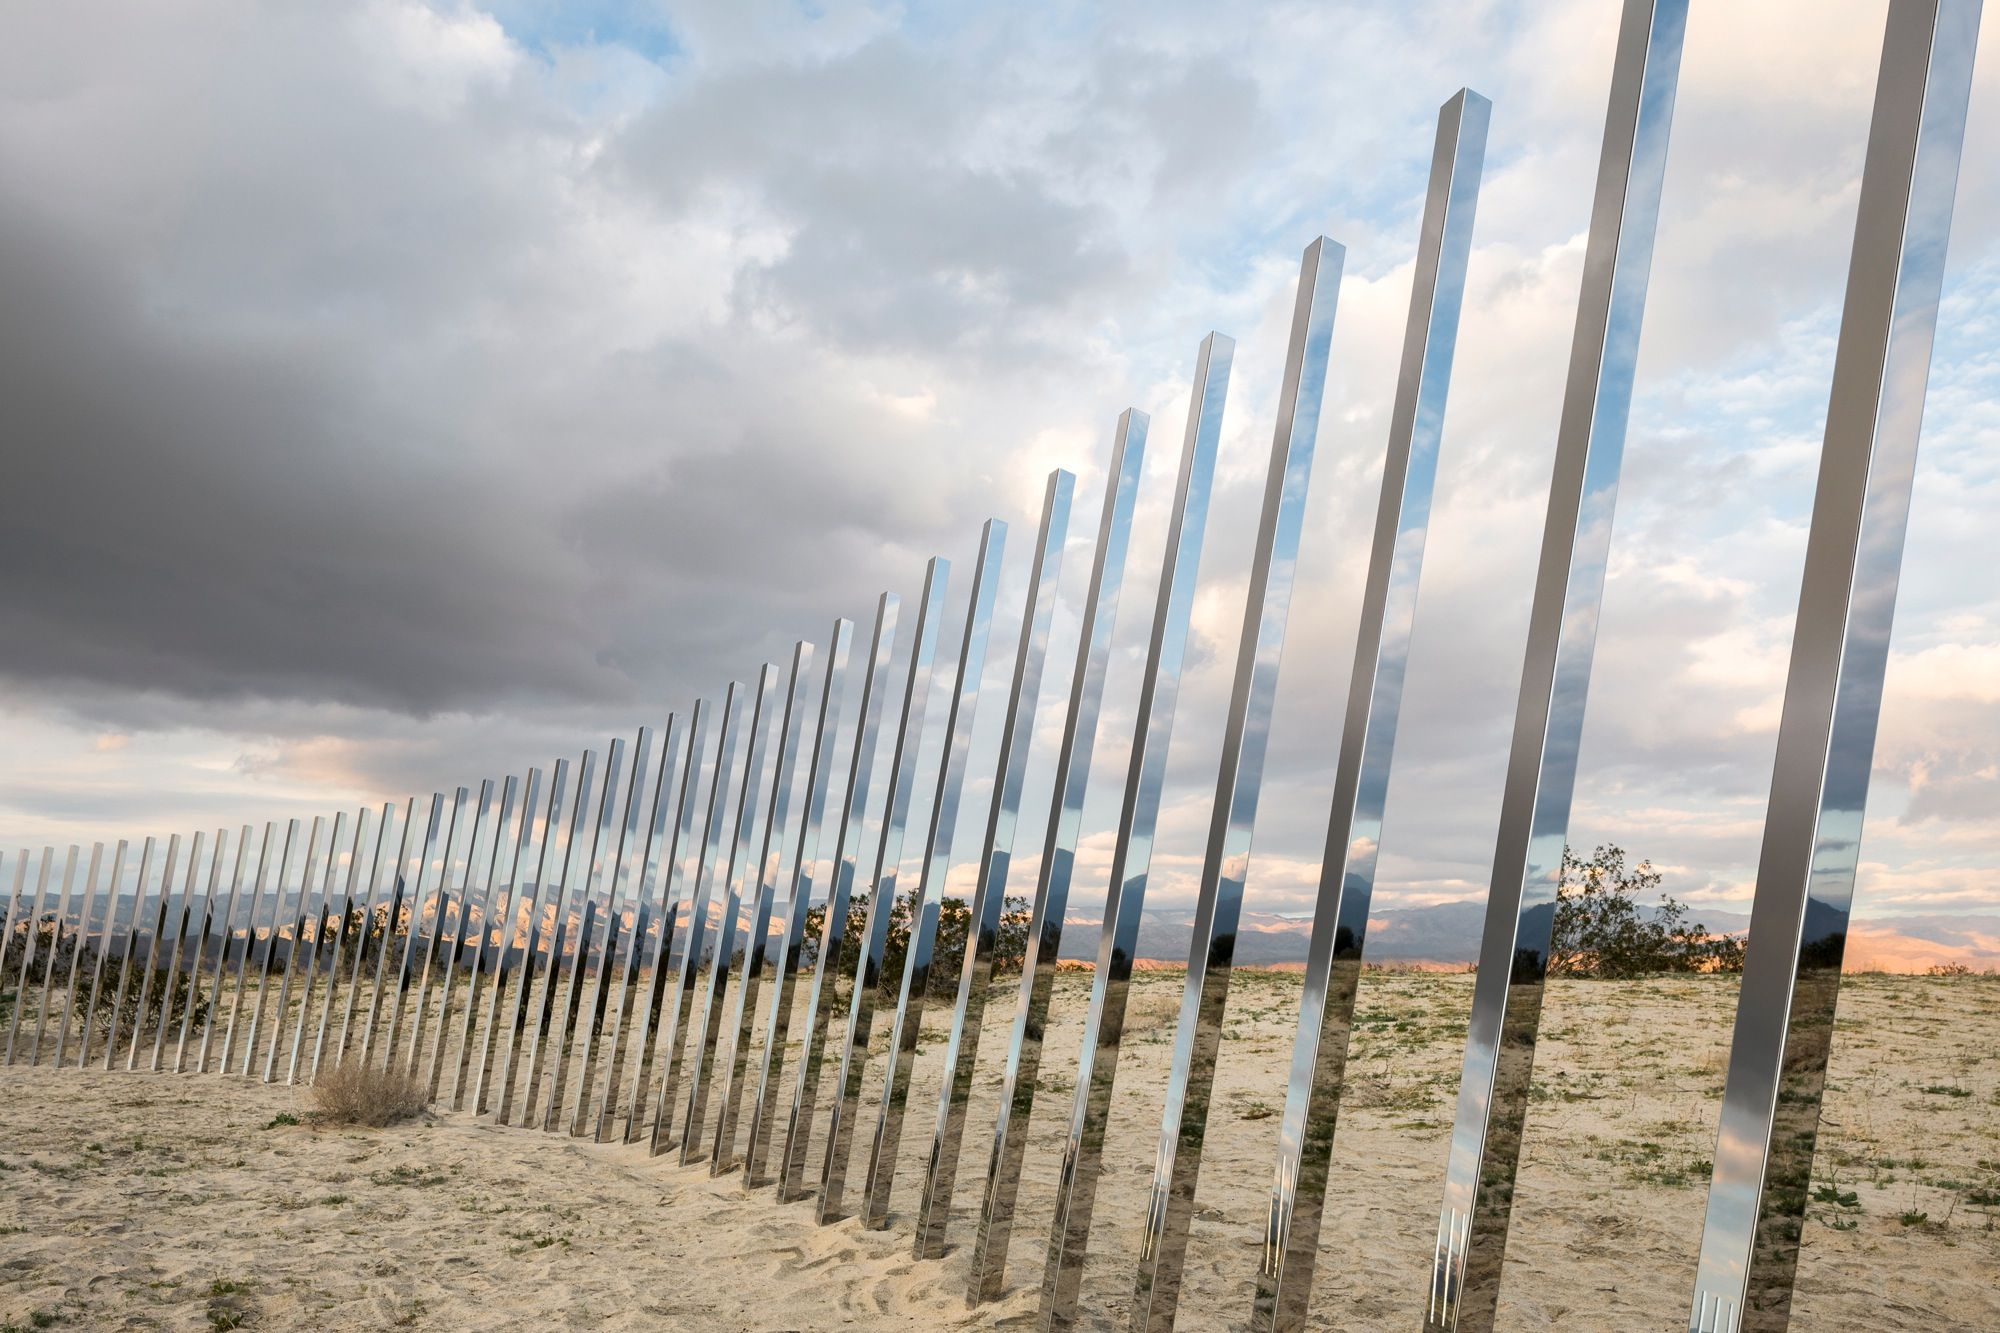 Making Art For A Desert Landscape With Images Coachella Valley Installation Art Desert Art